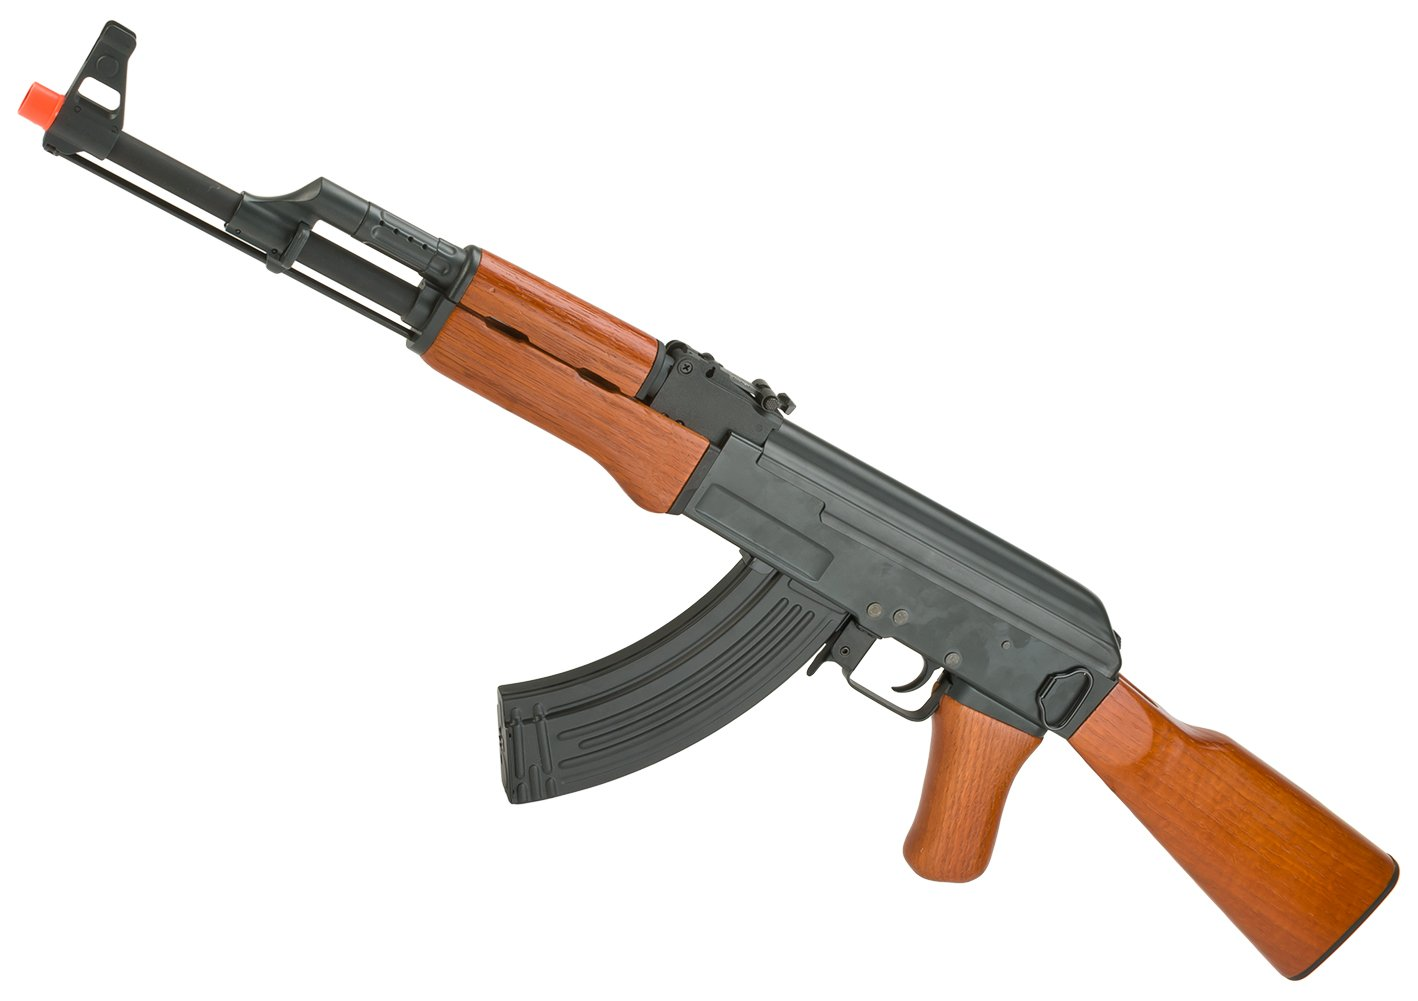 Evike - AK47 Advanced Full Metal Real Wood Airsoft AEG w/ Lipo Ready Gearbox by CYMA / Matrix - (30088)